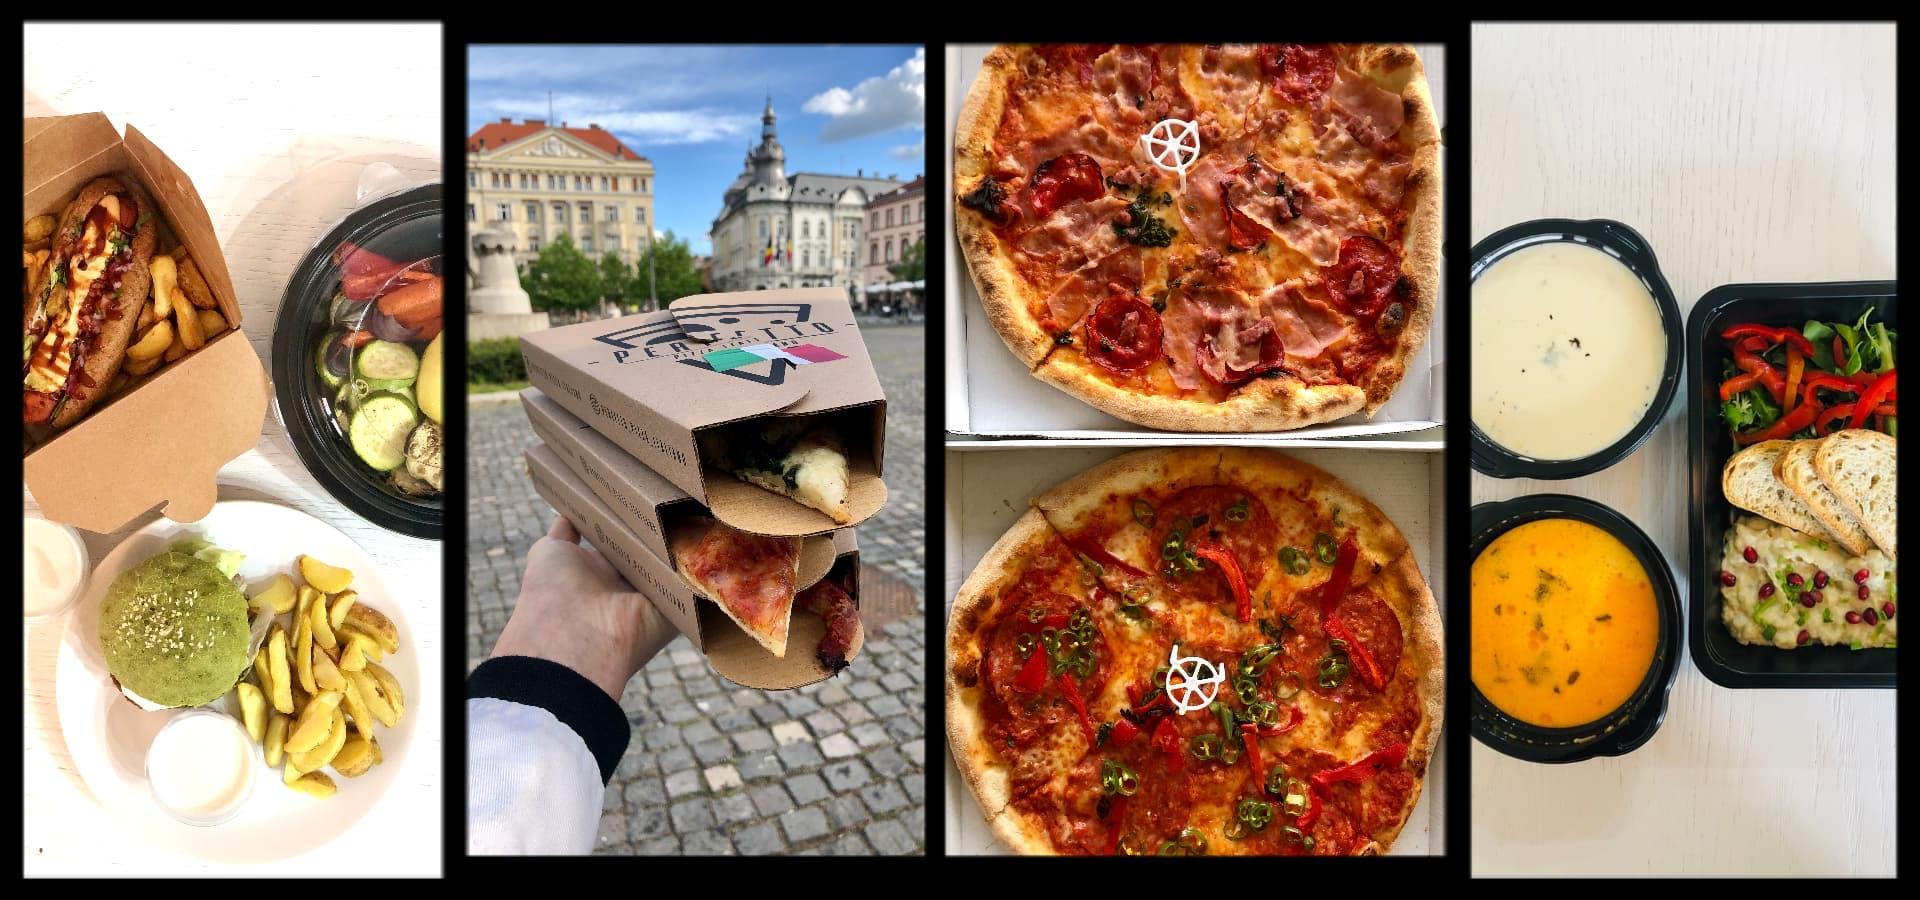 4 localuri recent deschise în Cluj: Pizzarelli Bar, VEGgo, Perfetto Pizza Italiano și Garlic Bites & Tales